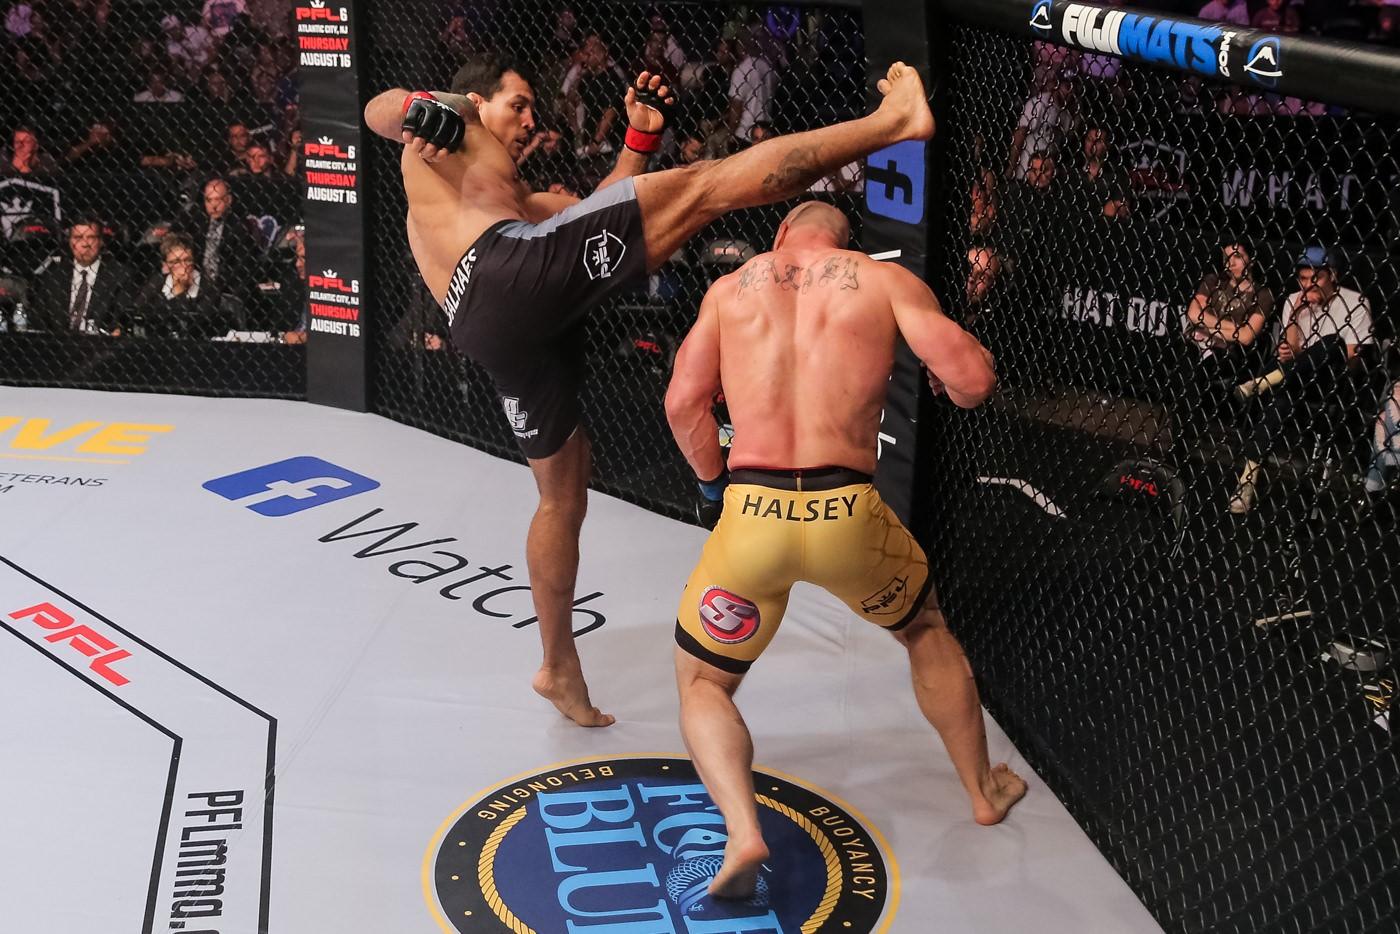 Vinny Magalhaes fights Brandon Halsey at PFL 5